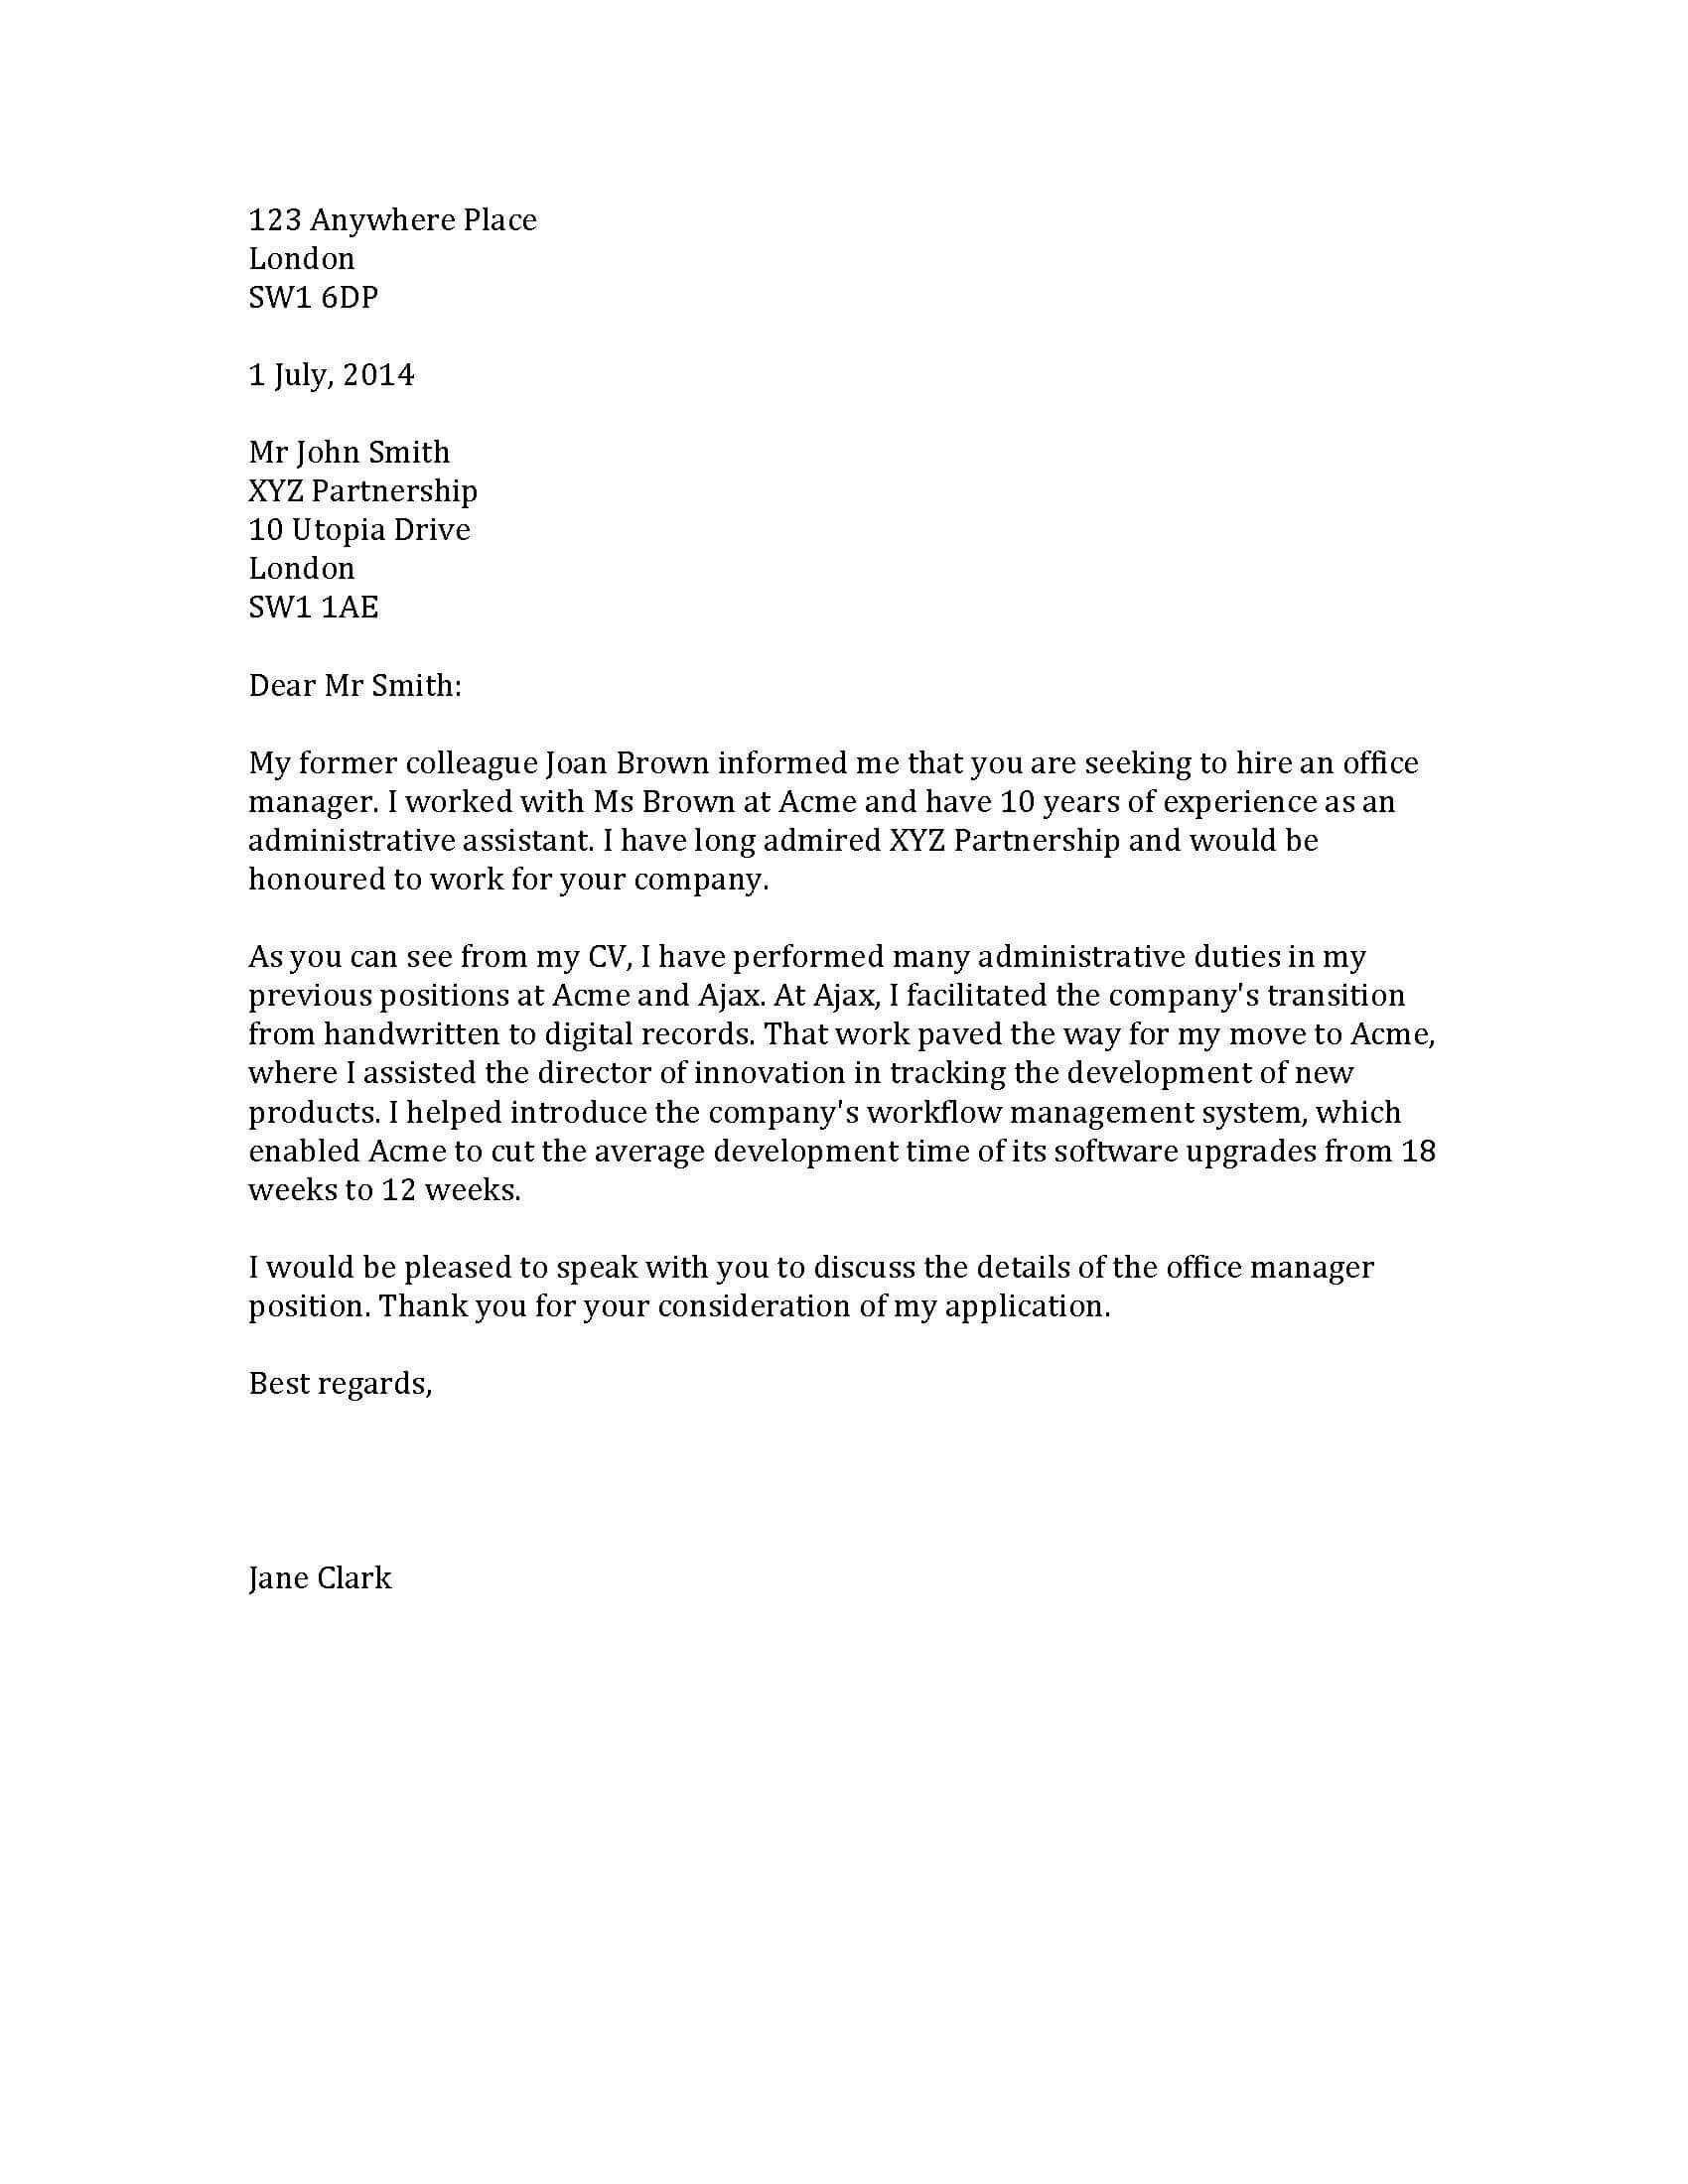 Letter Formats Block, Modified Block in 2020 Letter